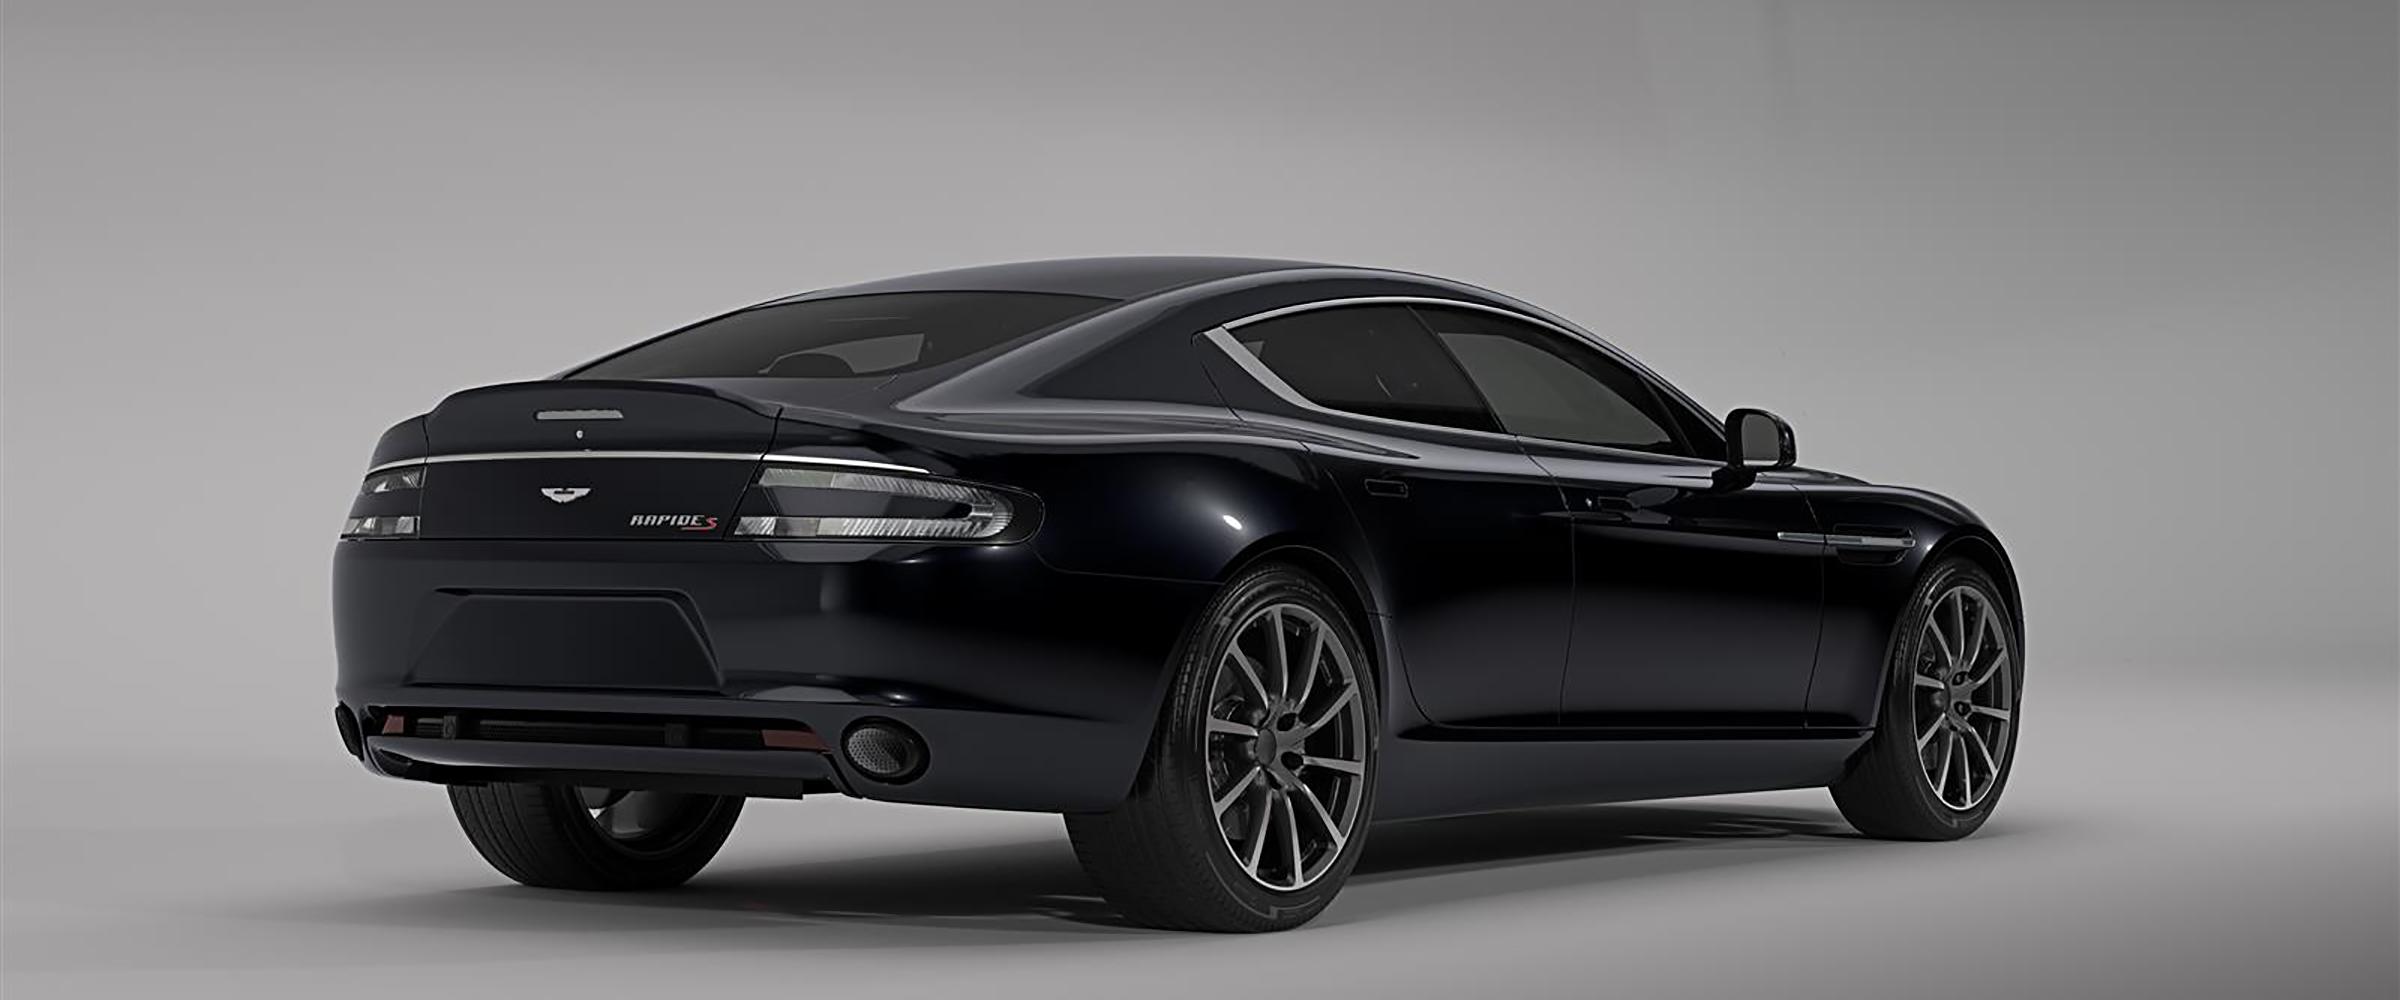 2014 Aston Martin Rapide Interior Wiring Diagrams Wiring